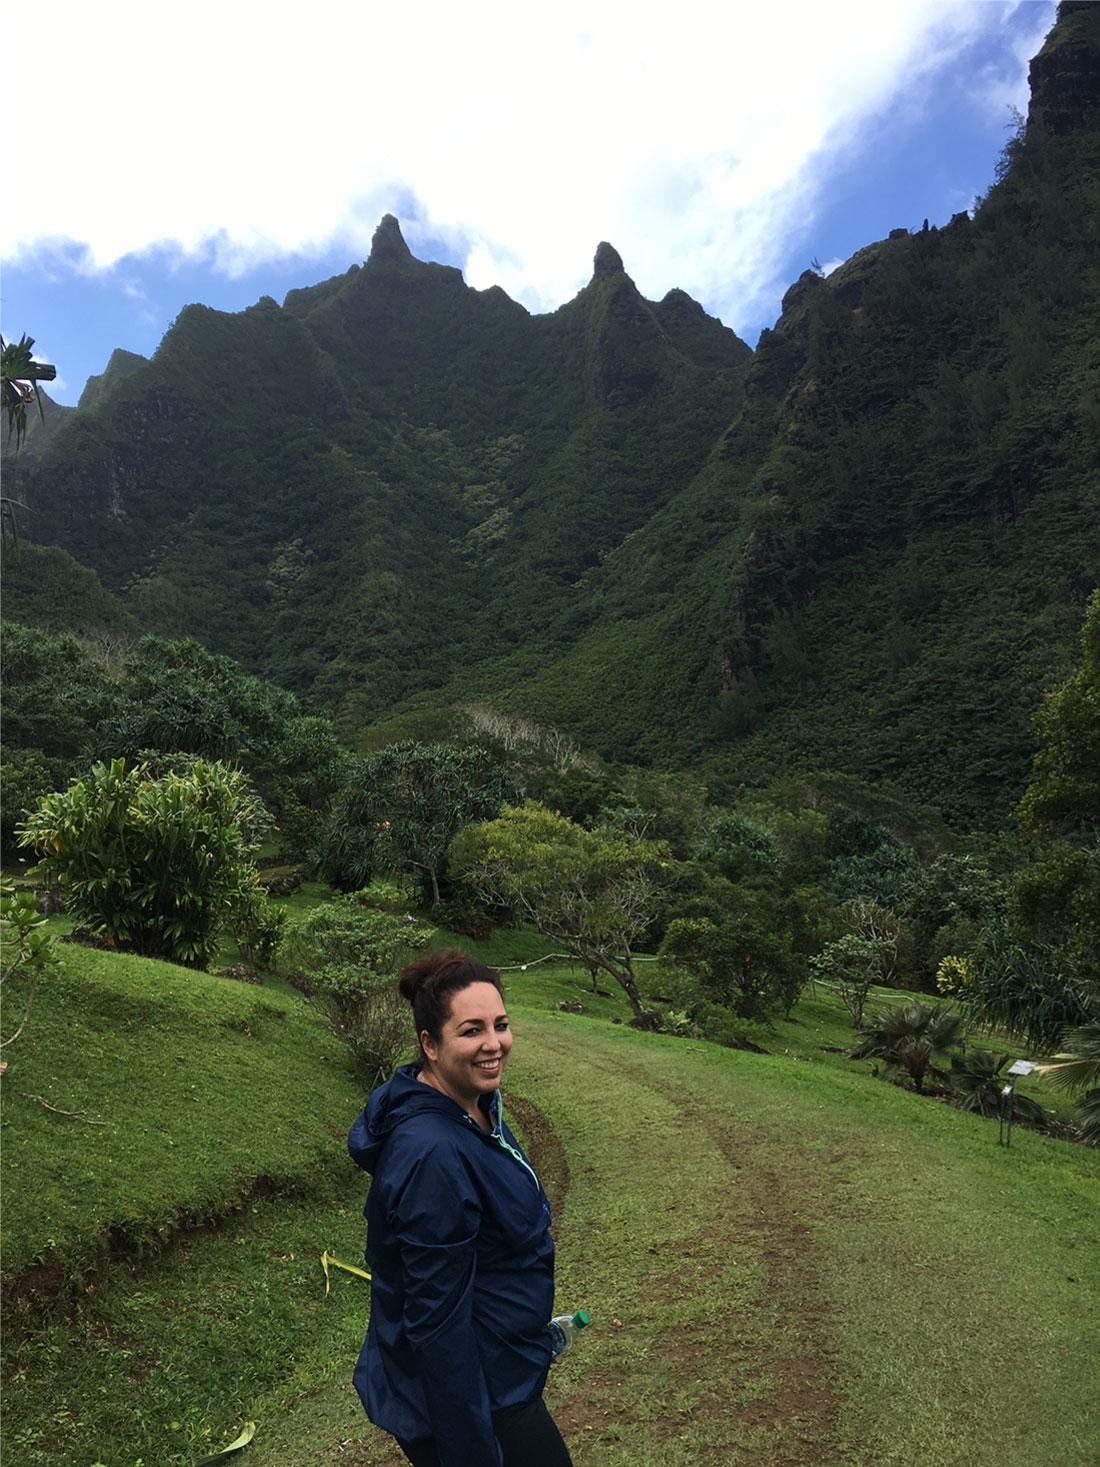 Travel - Things to do in Kauai - Gardens